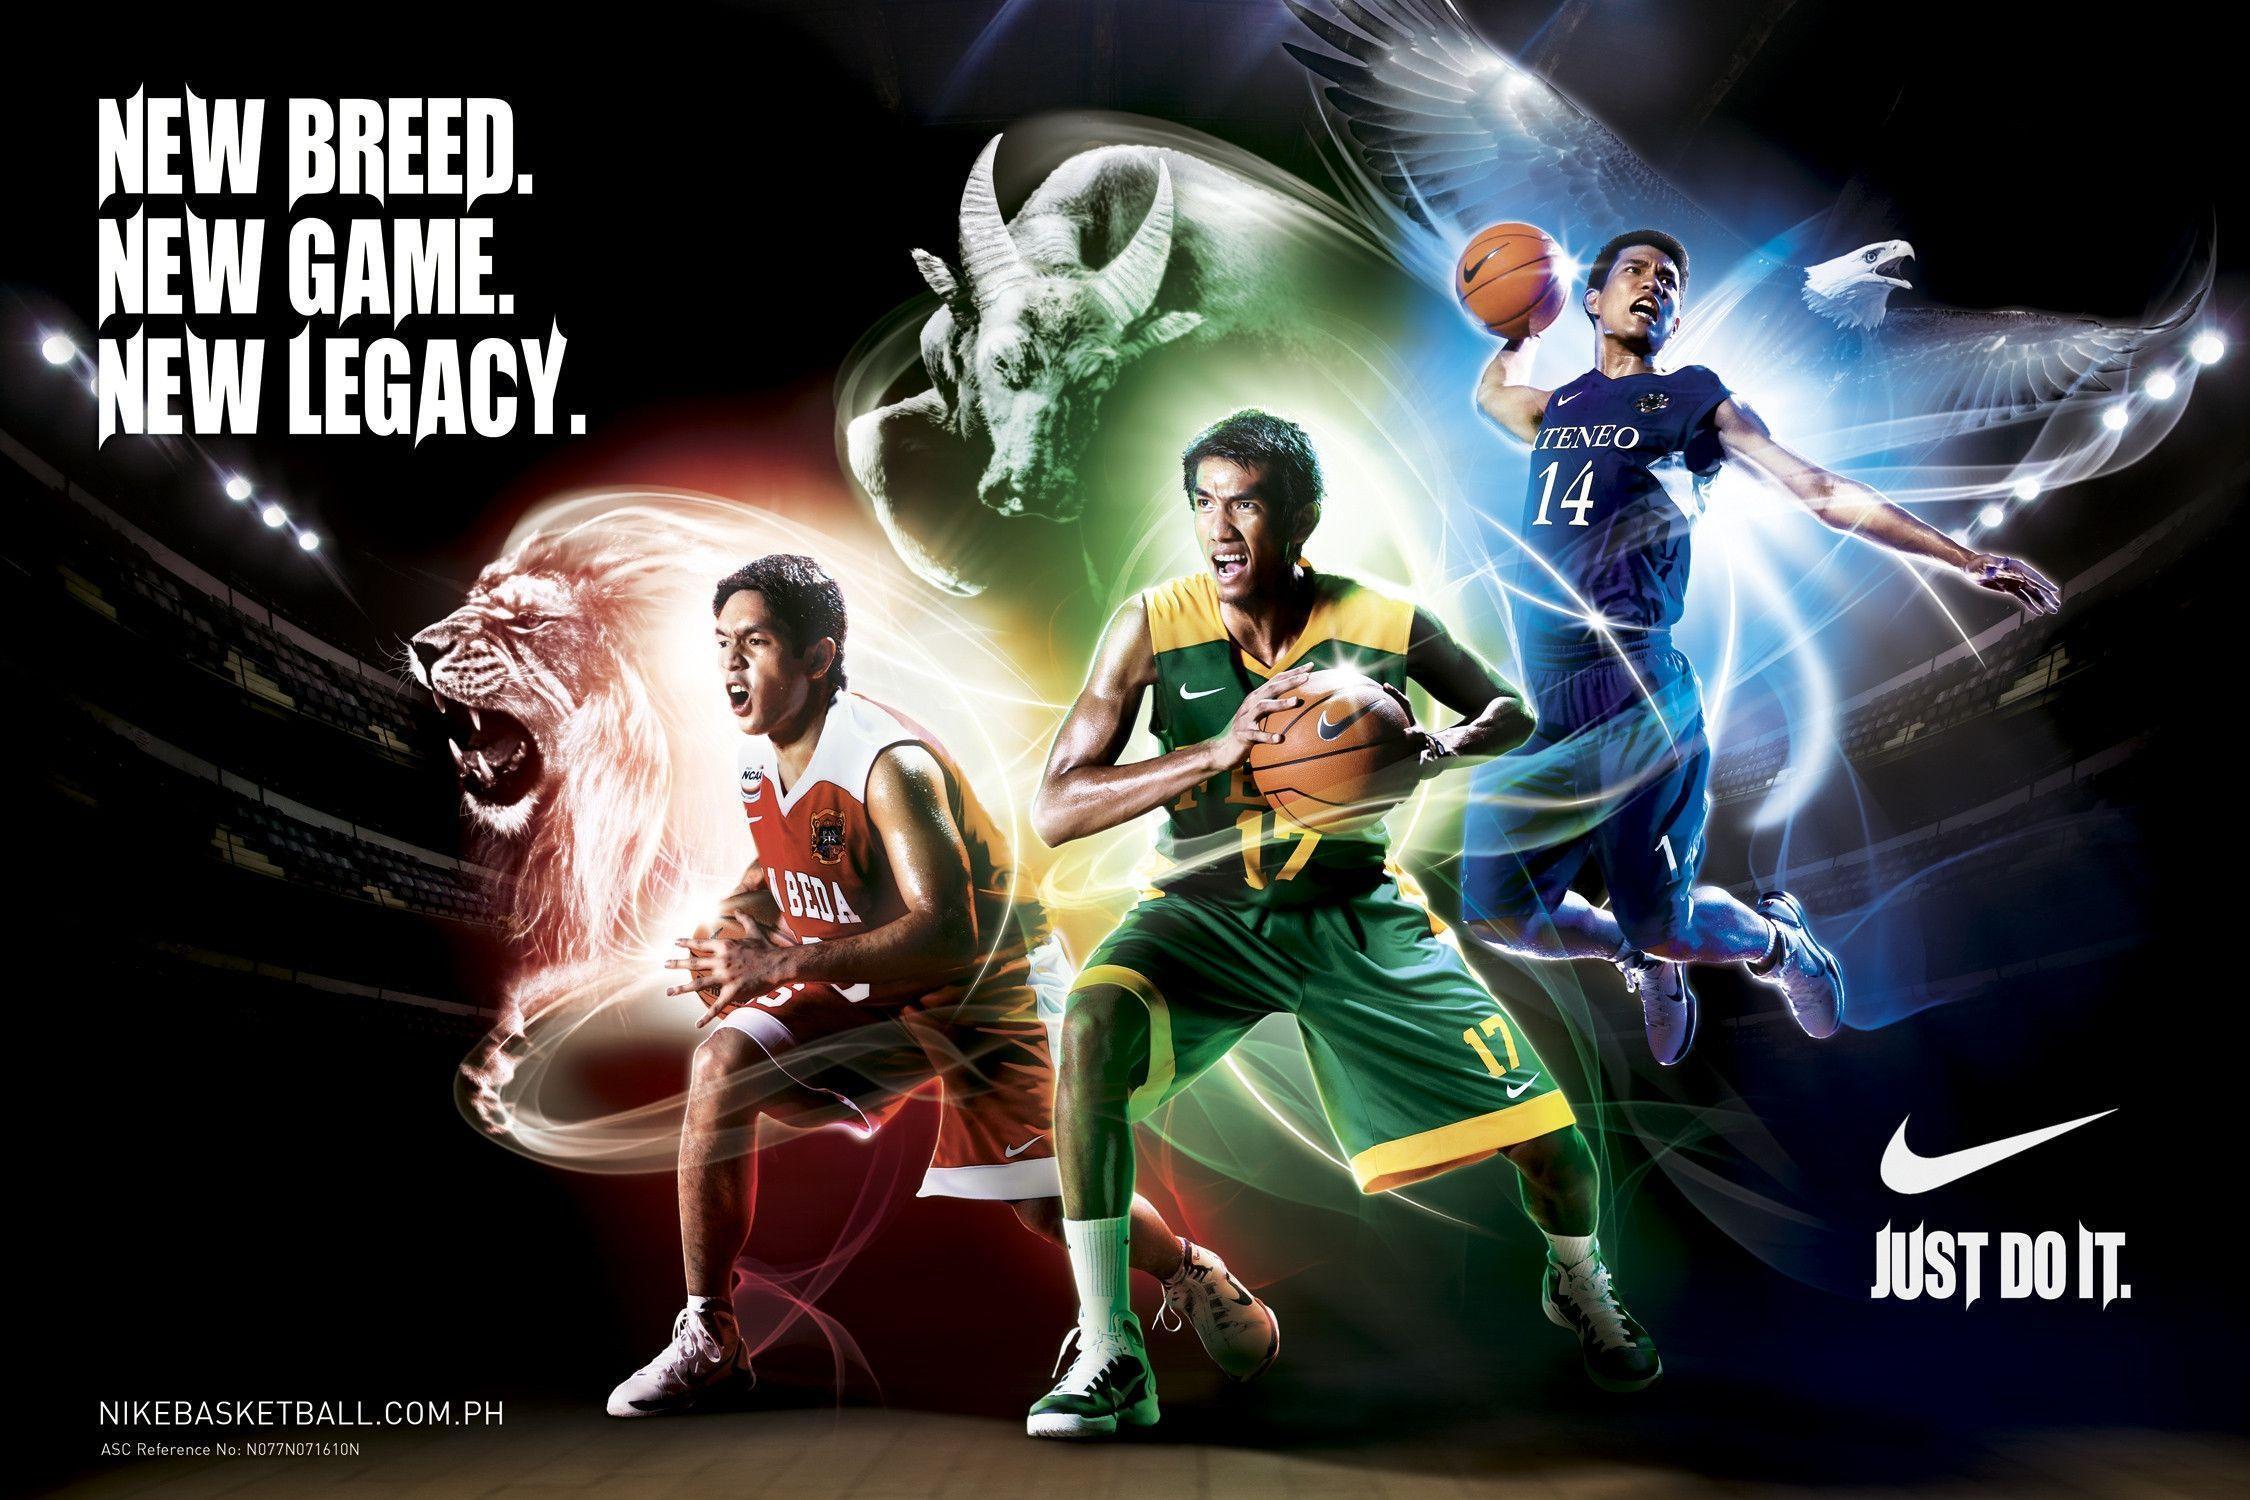 nike college basketball wallpaper - photo #17